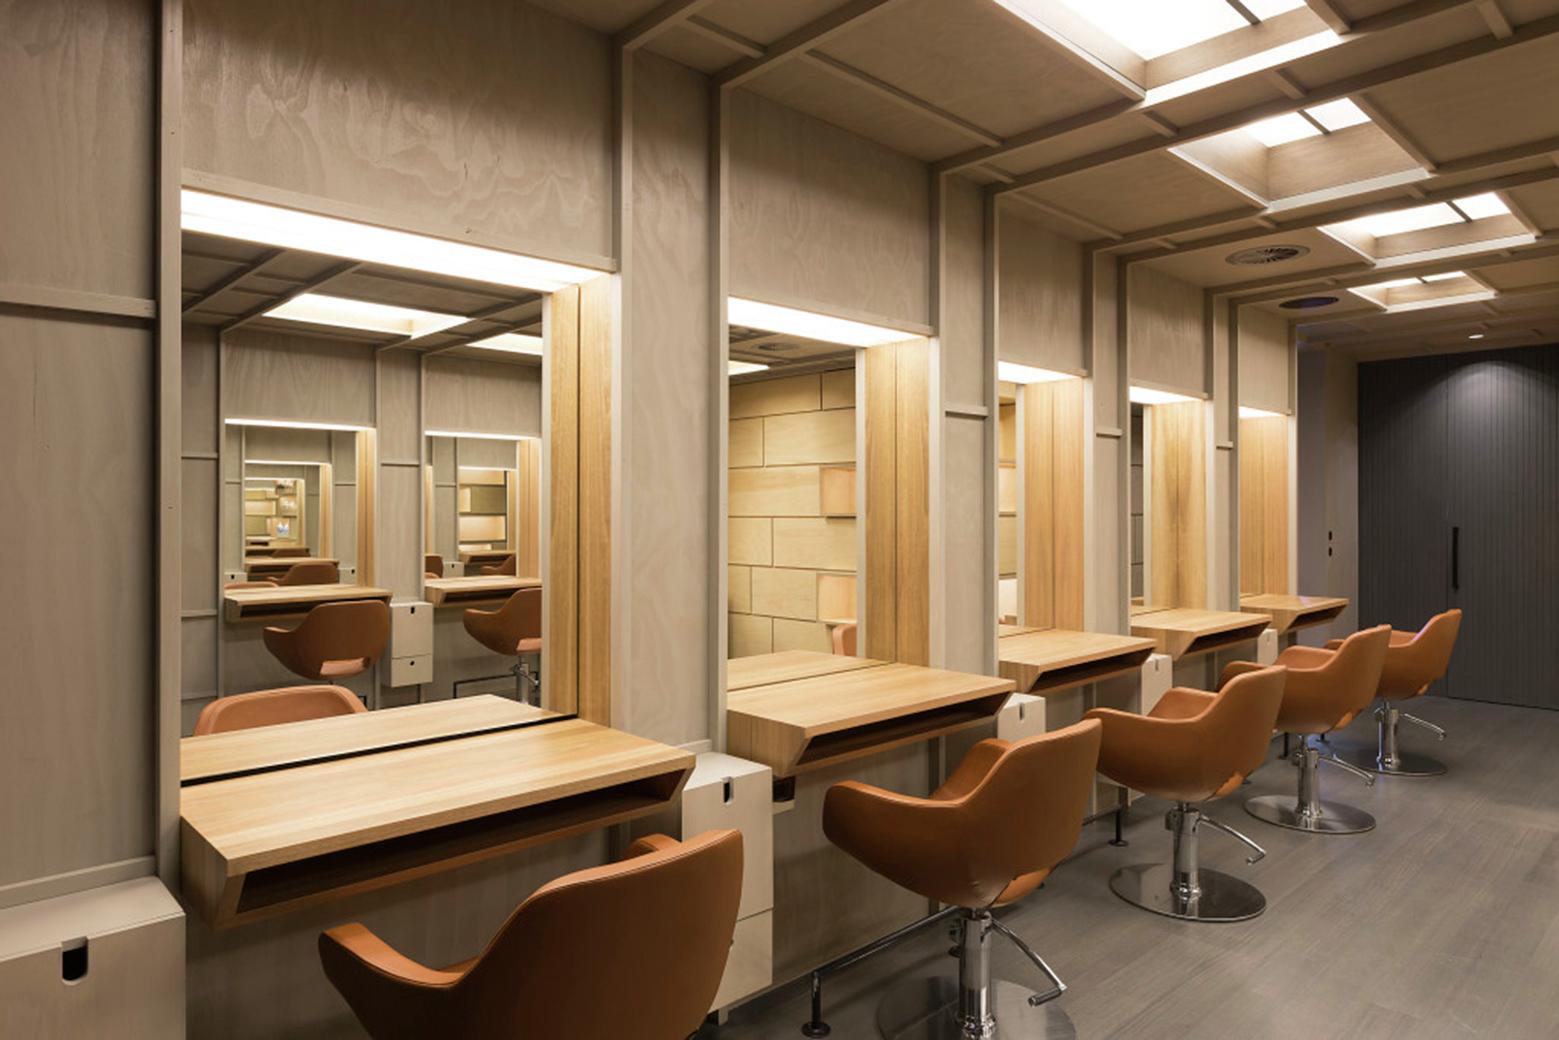 Gallery Of Roji Salon Craig Tan Architects 9